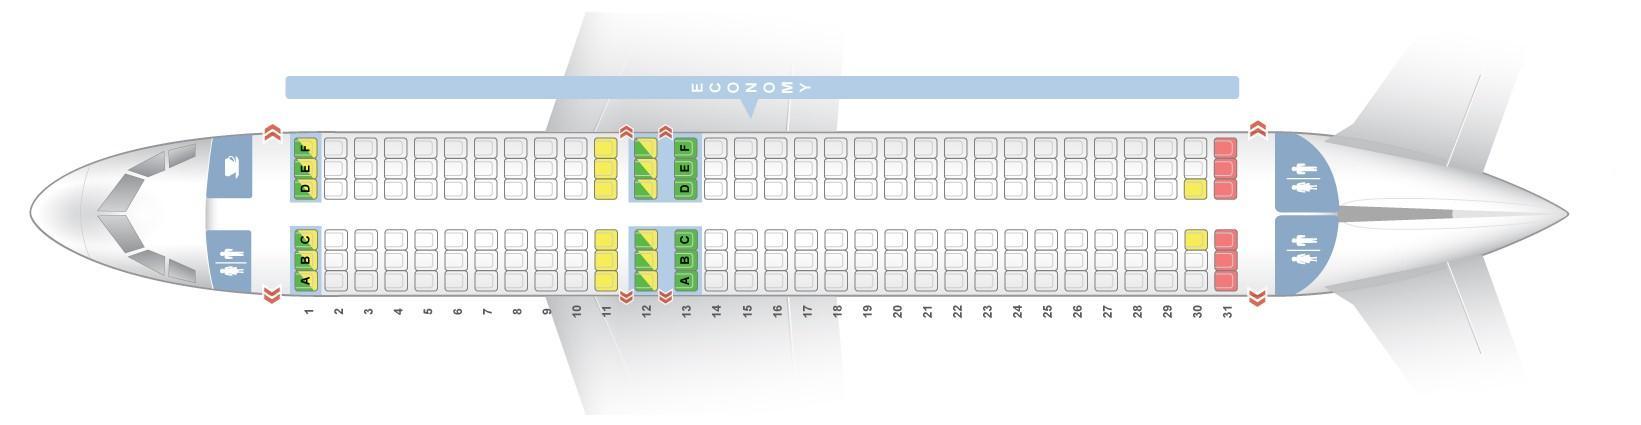 easyjet a320 seating plan - photo #8